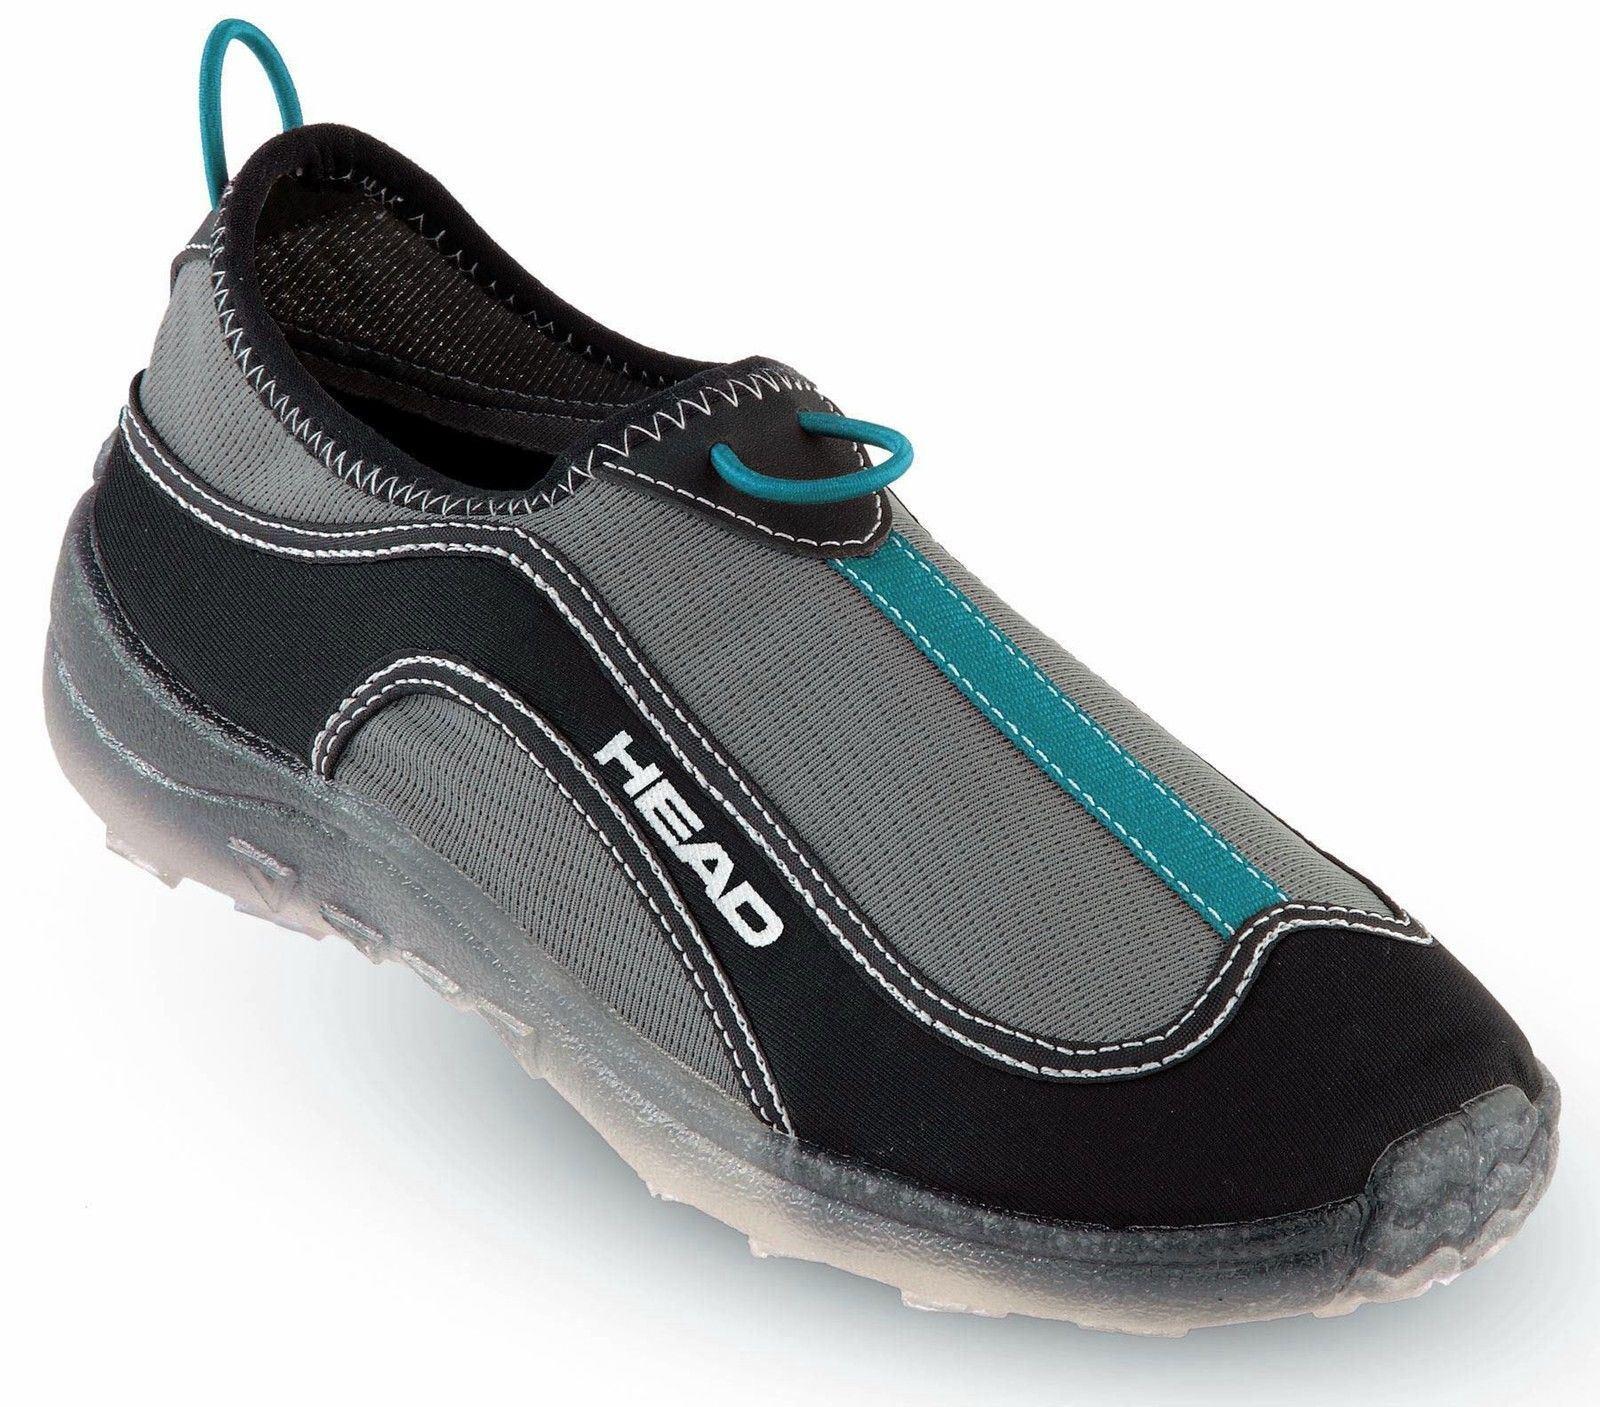 HEAD - Deluxe Fast Drain Aqua Trainer Beach Shoes - Black / Blue - Mens Ladies